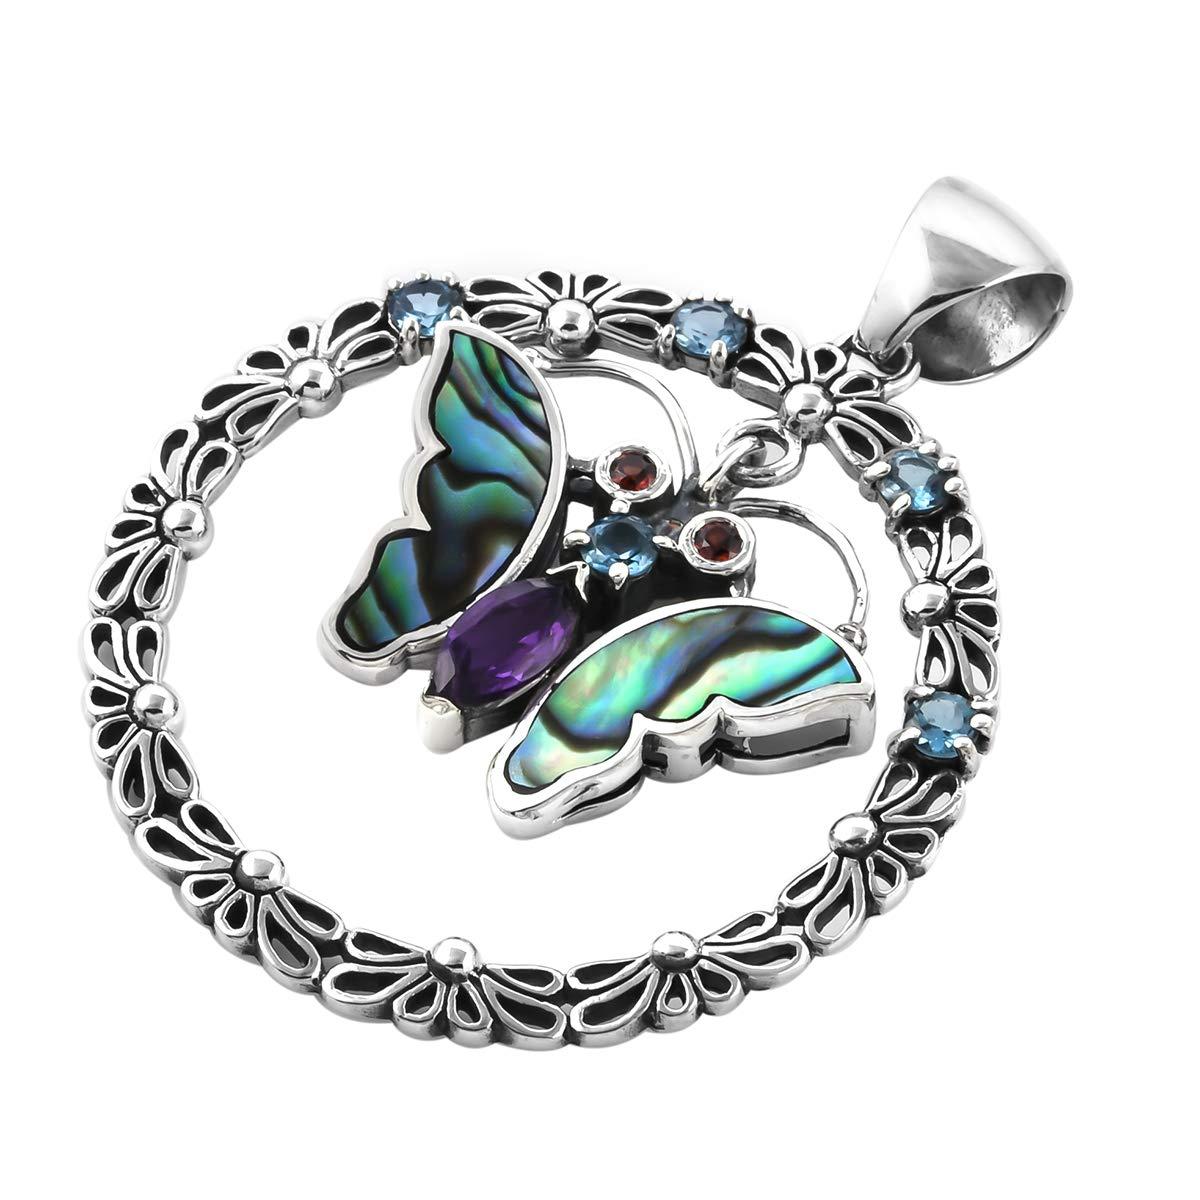 Abalone Shell Pendant 925 Sterling Silver Blue Topaz Amethyst Boho Handmade Jewelry for Women